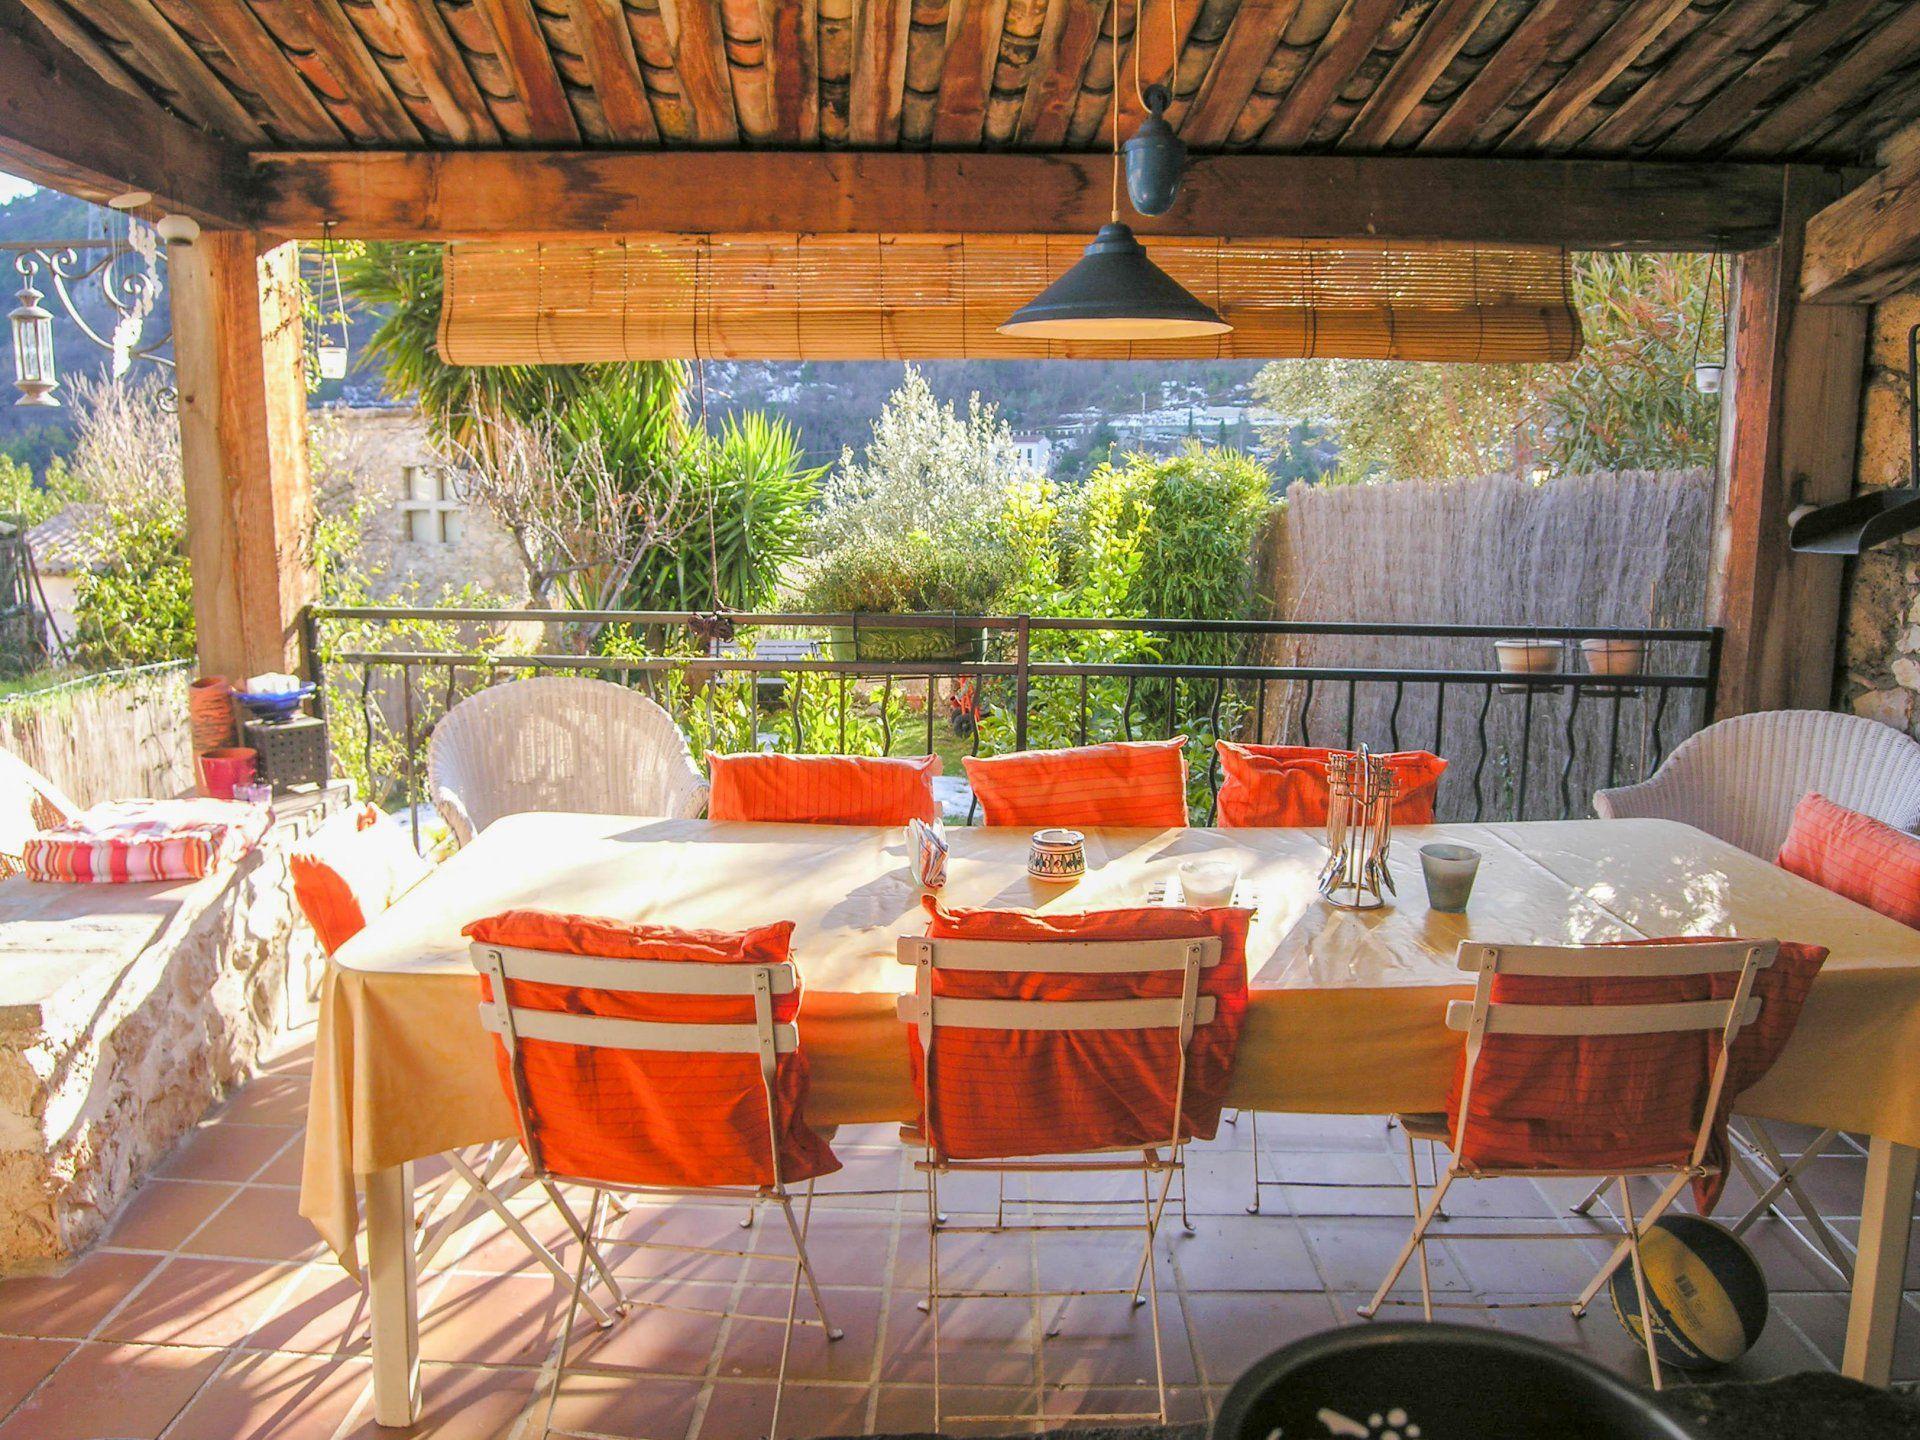 France property for sale in Alpes-Cote d`Azur, Le Broc